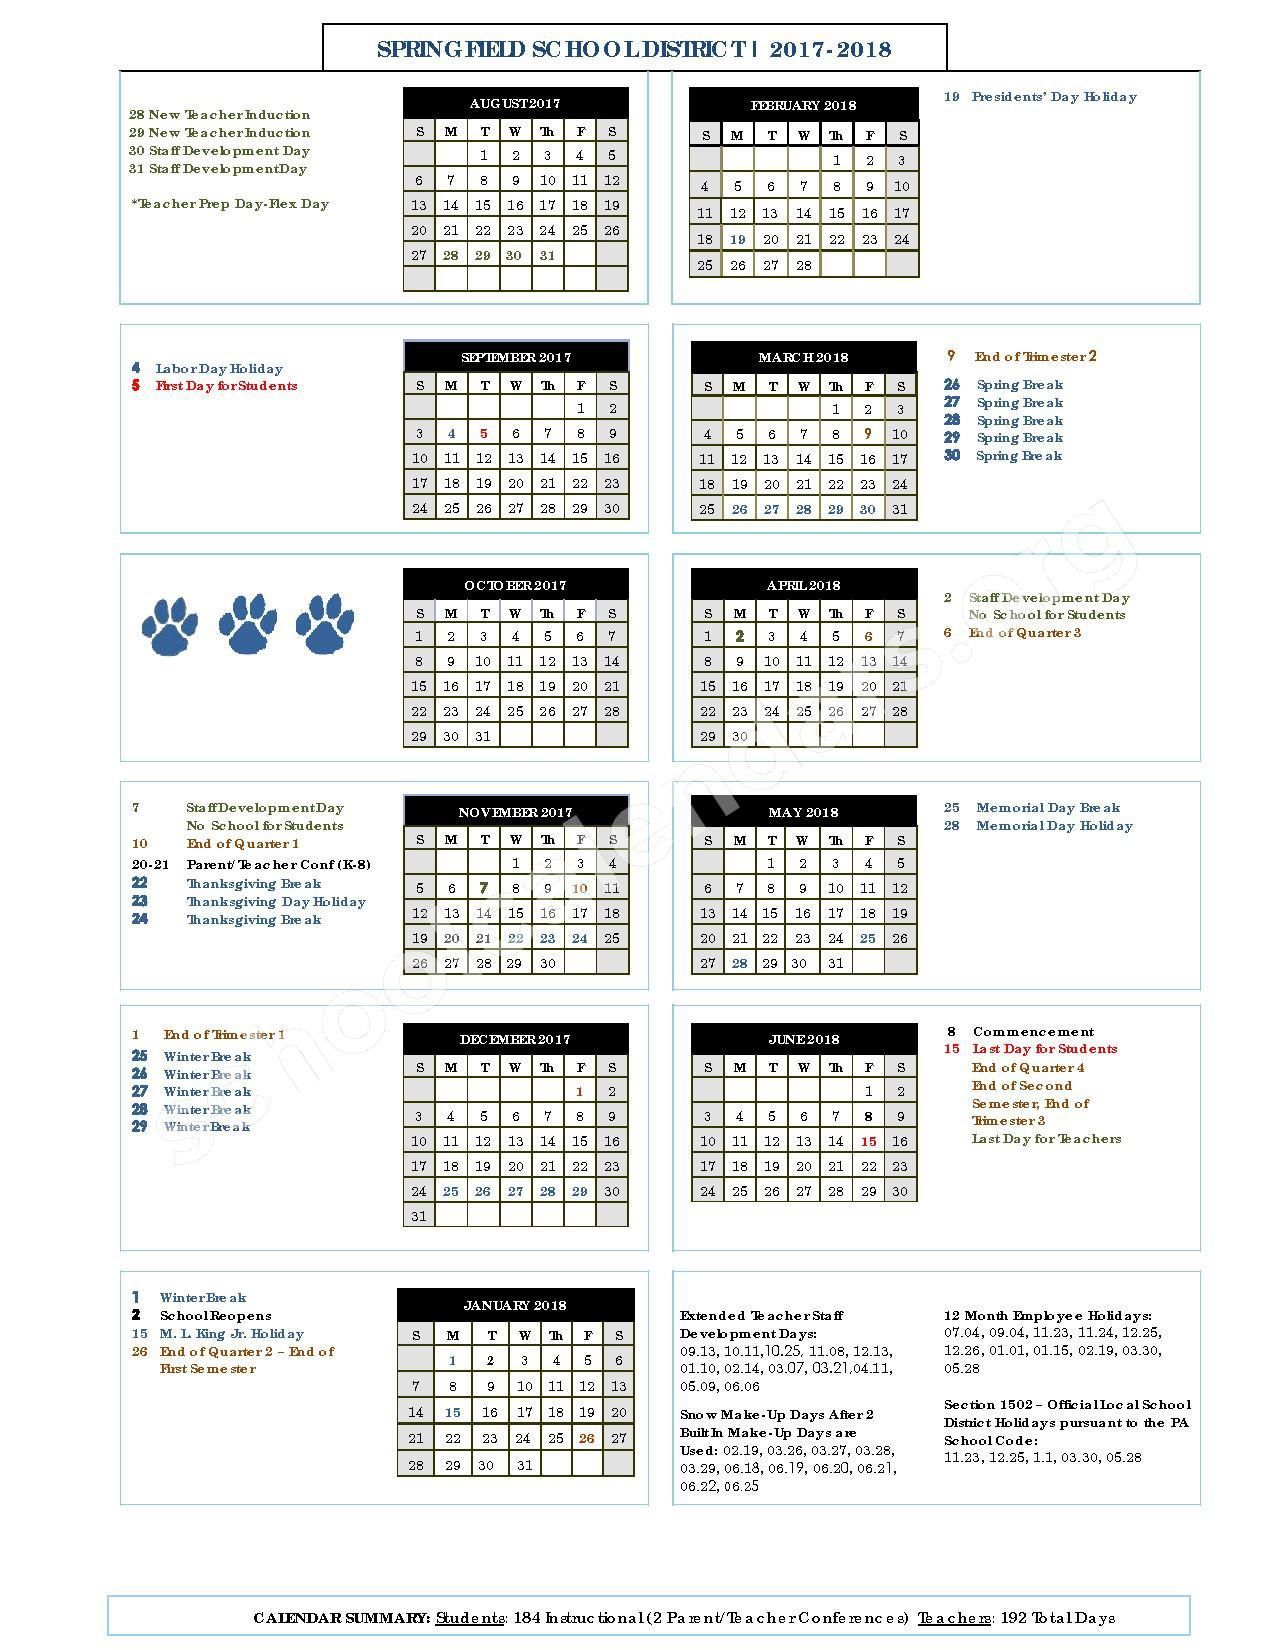 2017 - 2018 School Calendar – Scenic Hills Elementary School – page 1